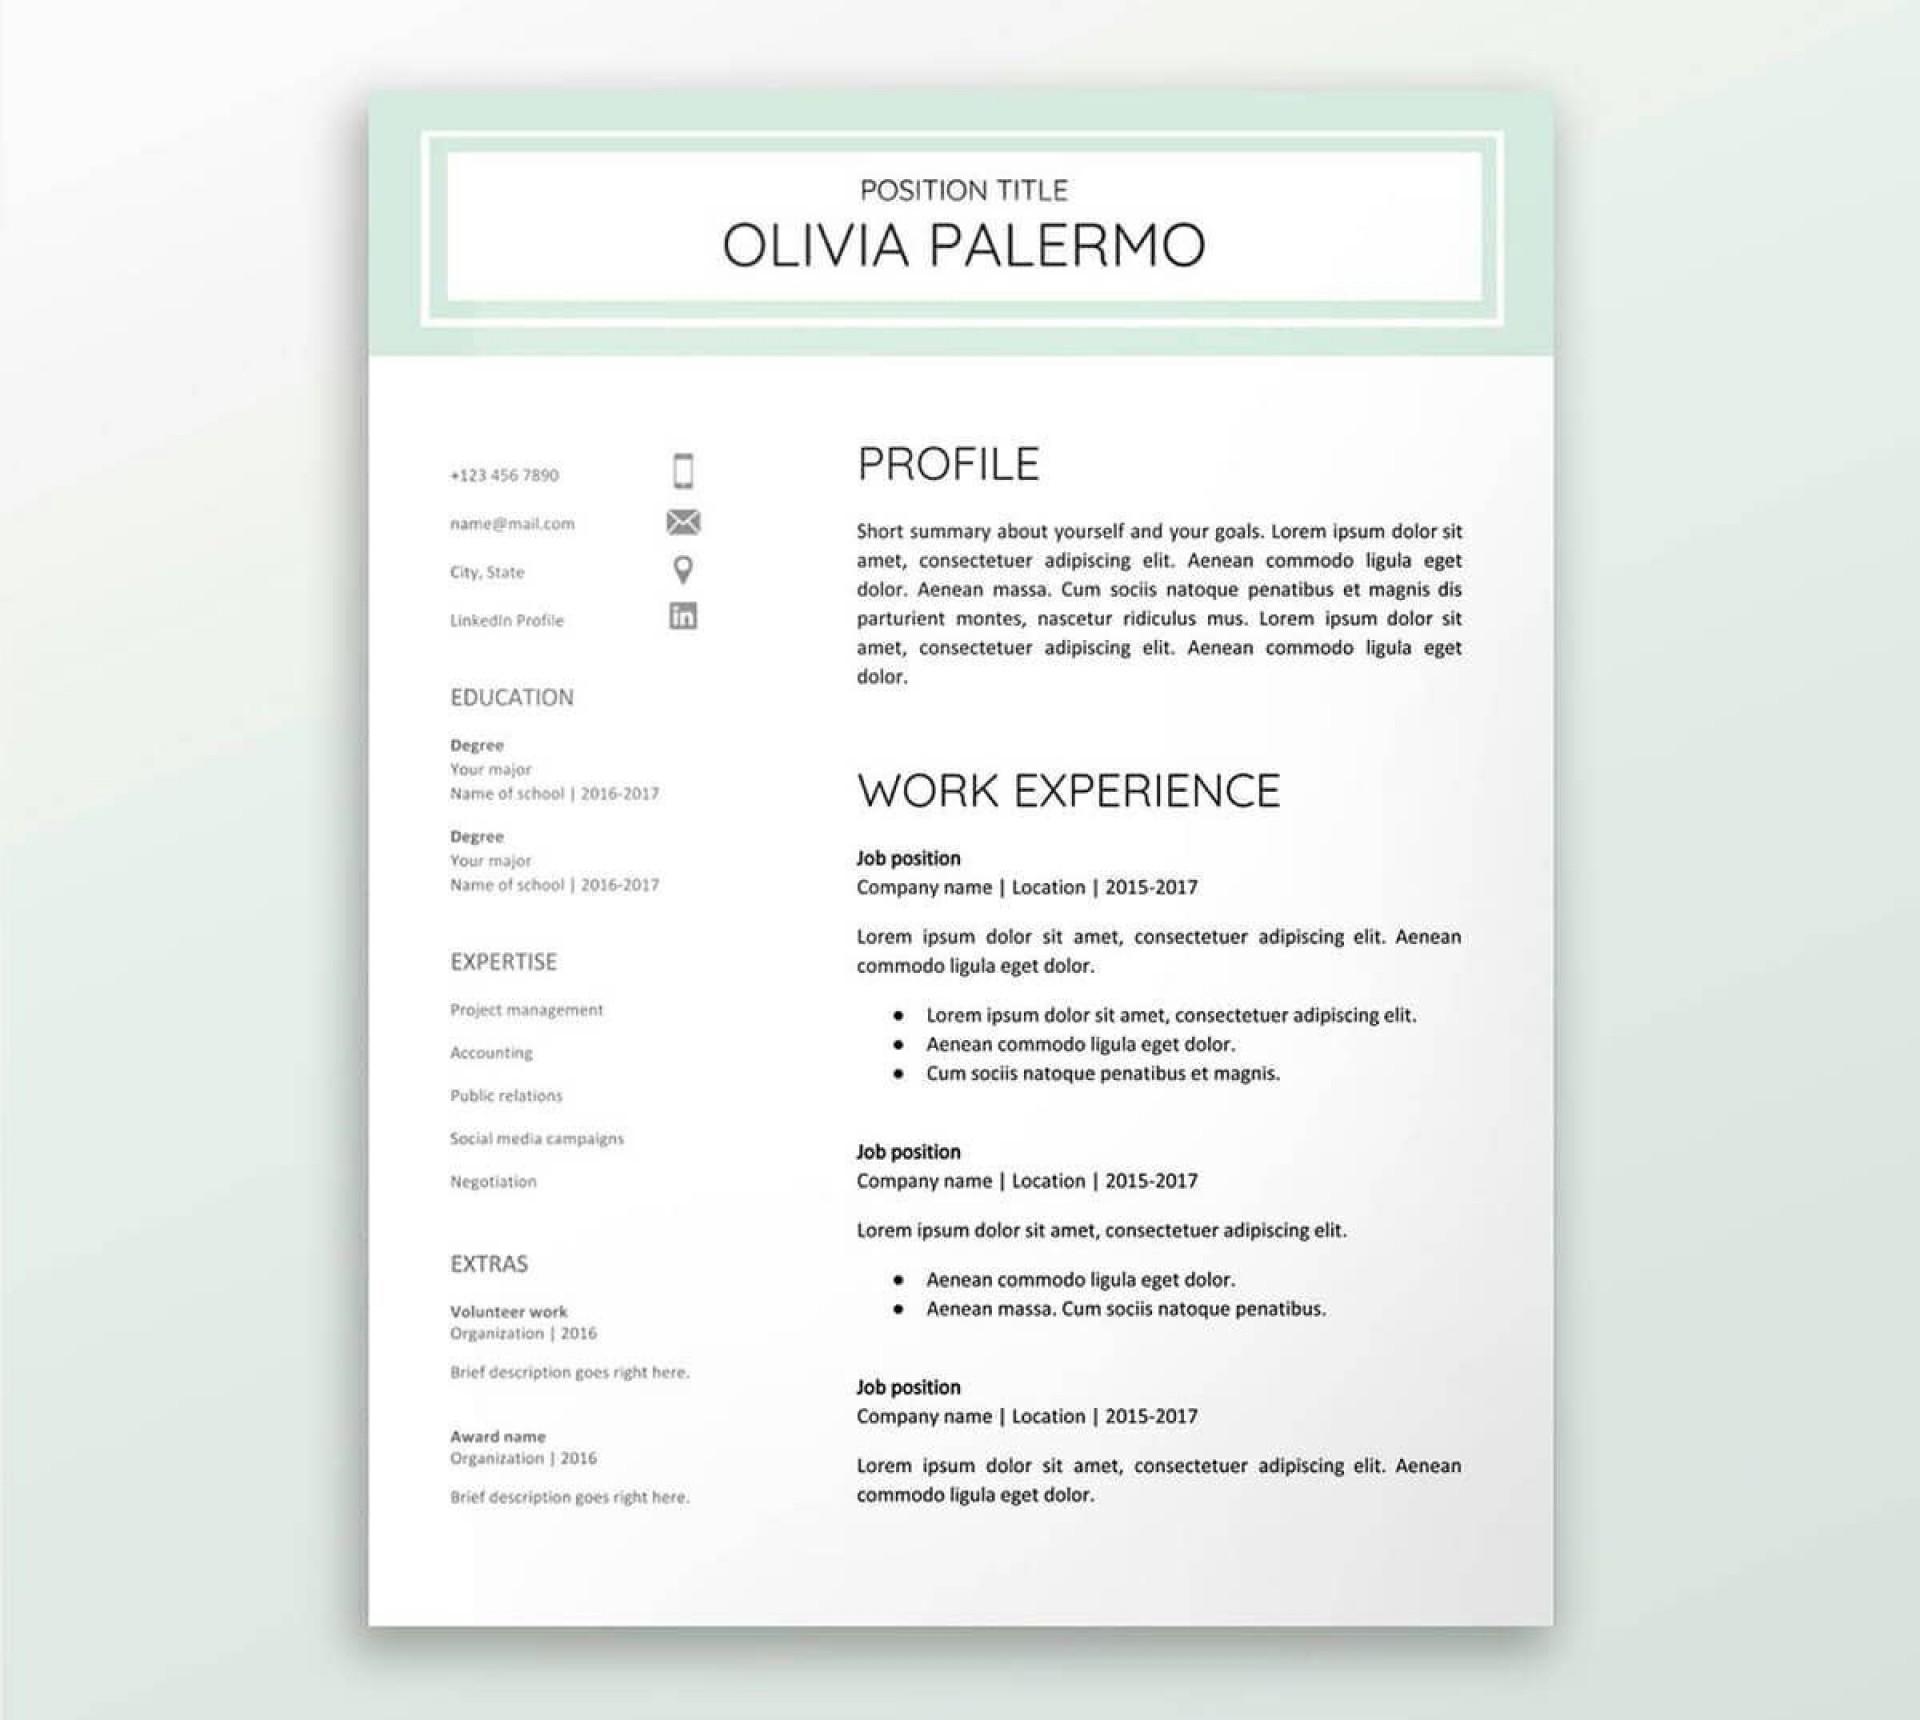 004 Astounding Entry Level Resume Template Google Doc High Definition  Docs1920